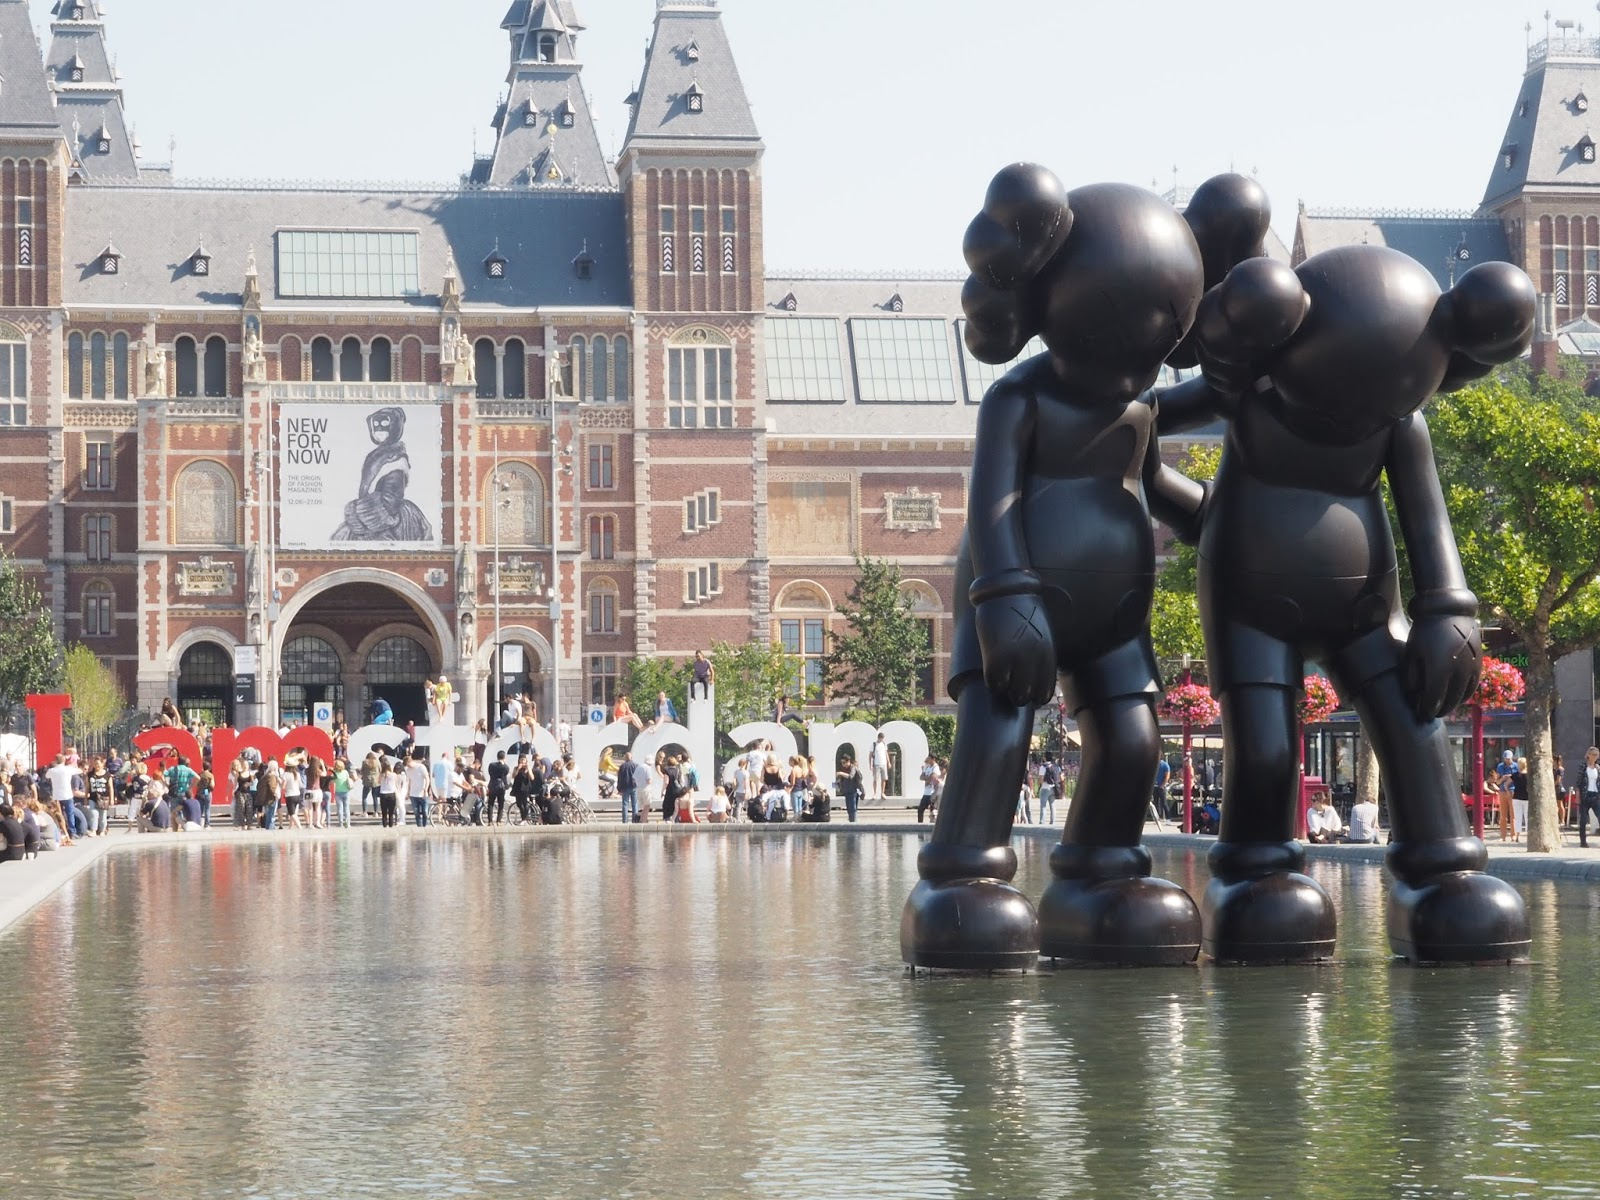 Astounding Amsterdam Interessante Orte Galerie Von I-am-amsterdam Sonnenuntergang-amsterdam